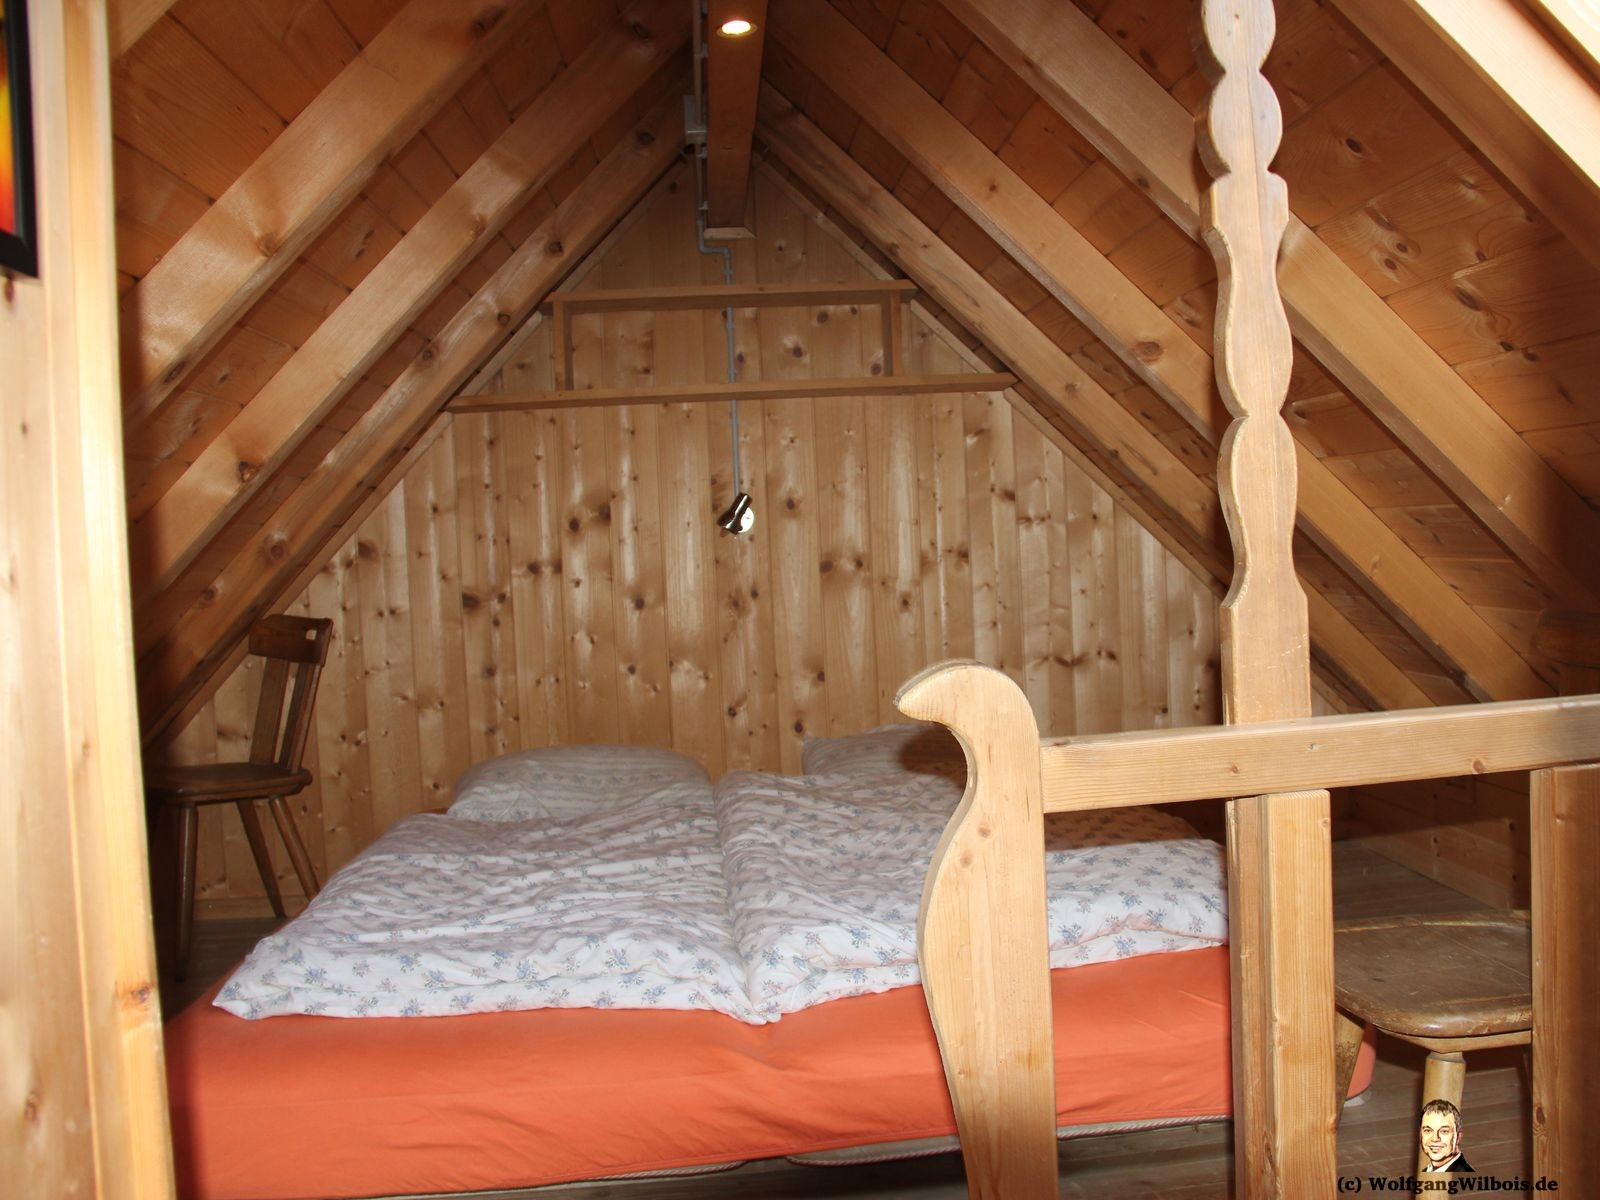 Costaces Huette Wuerzjoch Schlafzimmer